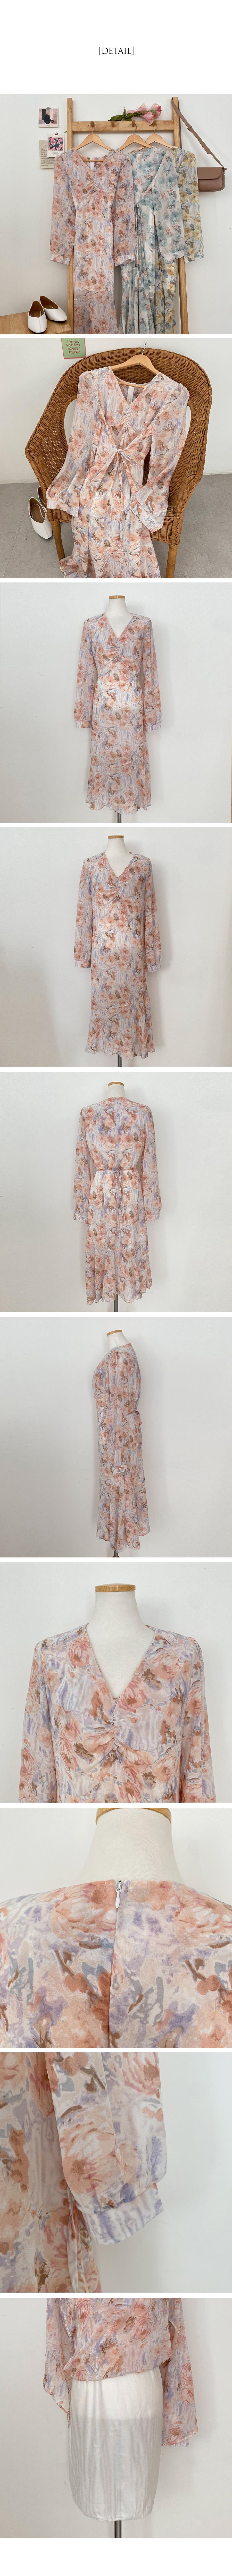 A drop of paint, flower mermaid long Dress